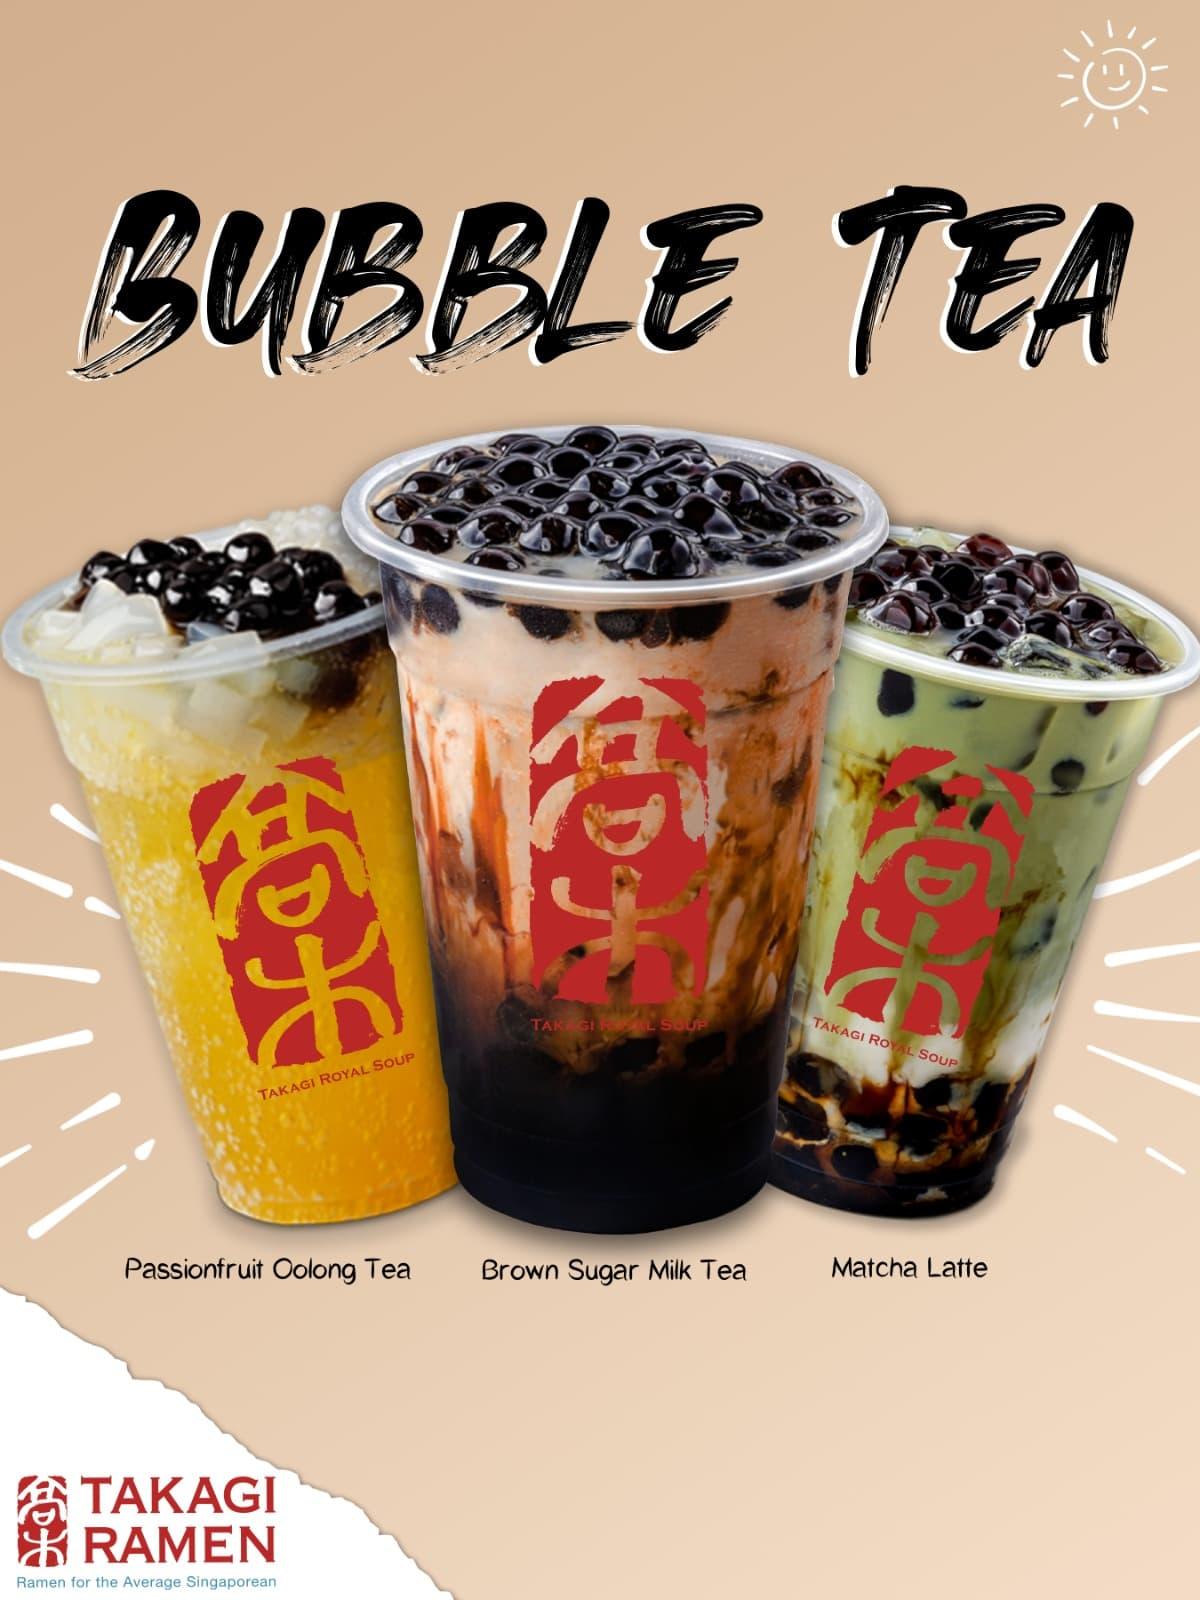 Takagi Ramen 24-hour - Bubble Tea